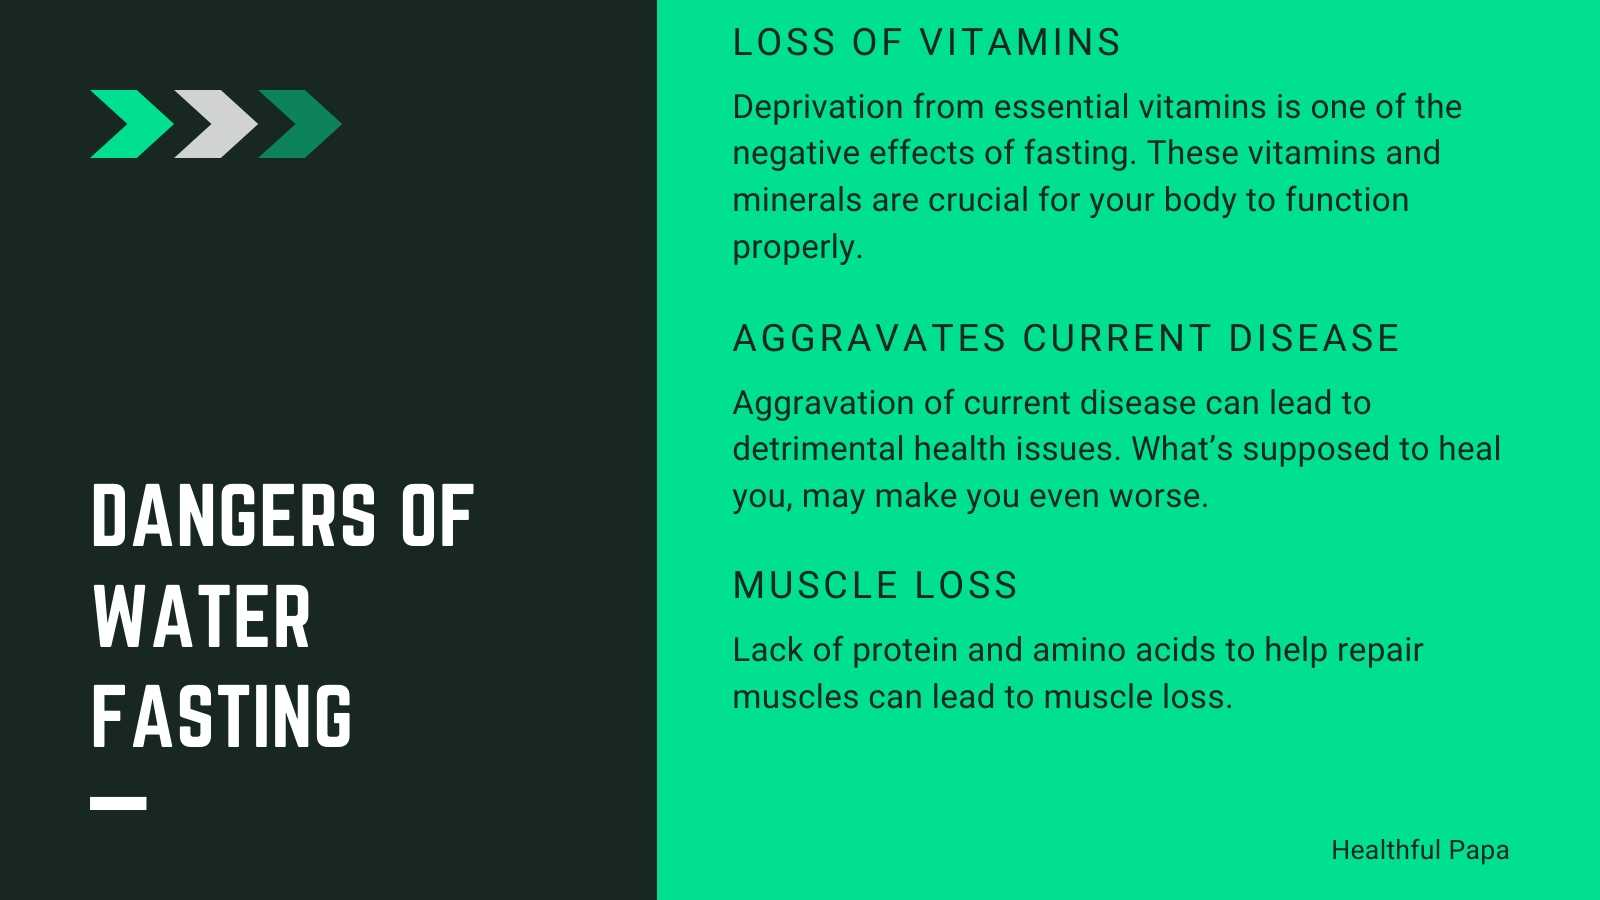 dangers of water fasting